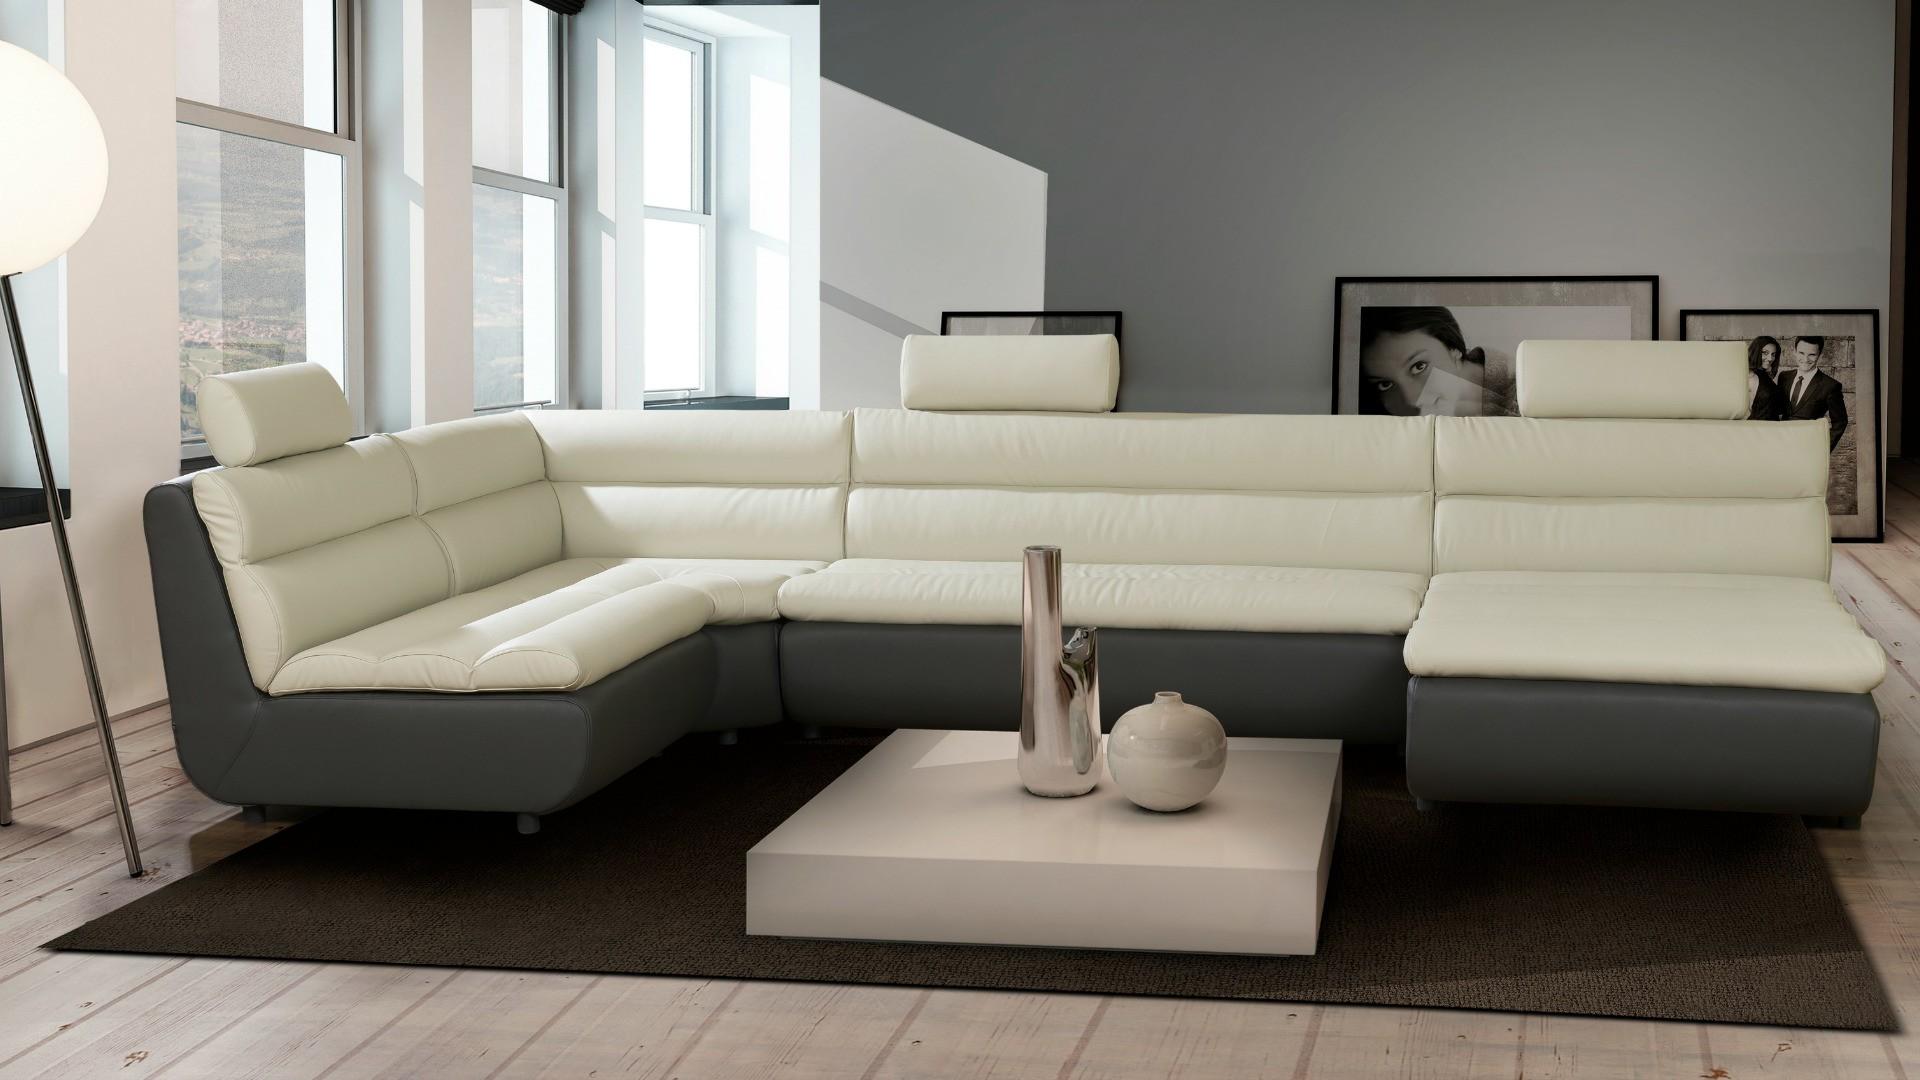 sofex sp j 187 meble tapicerowane